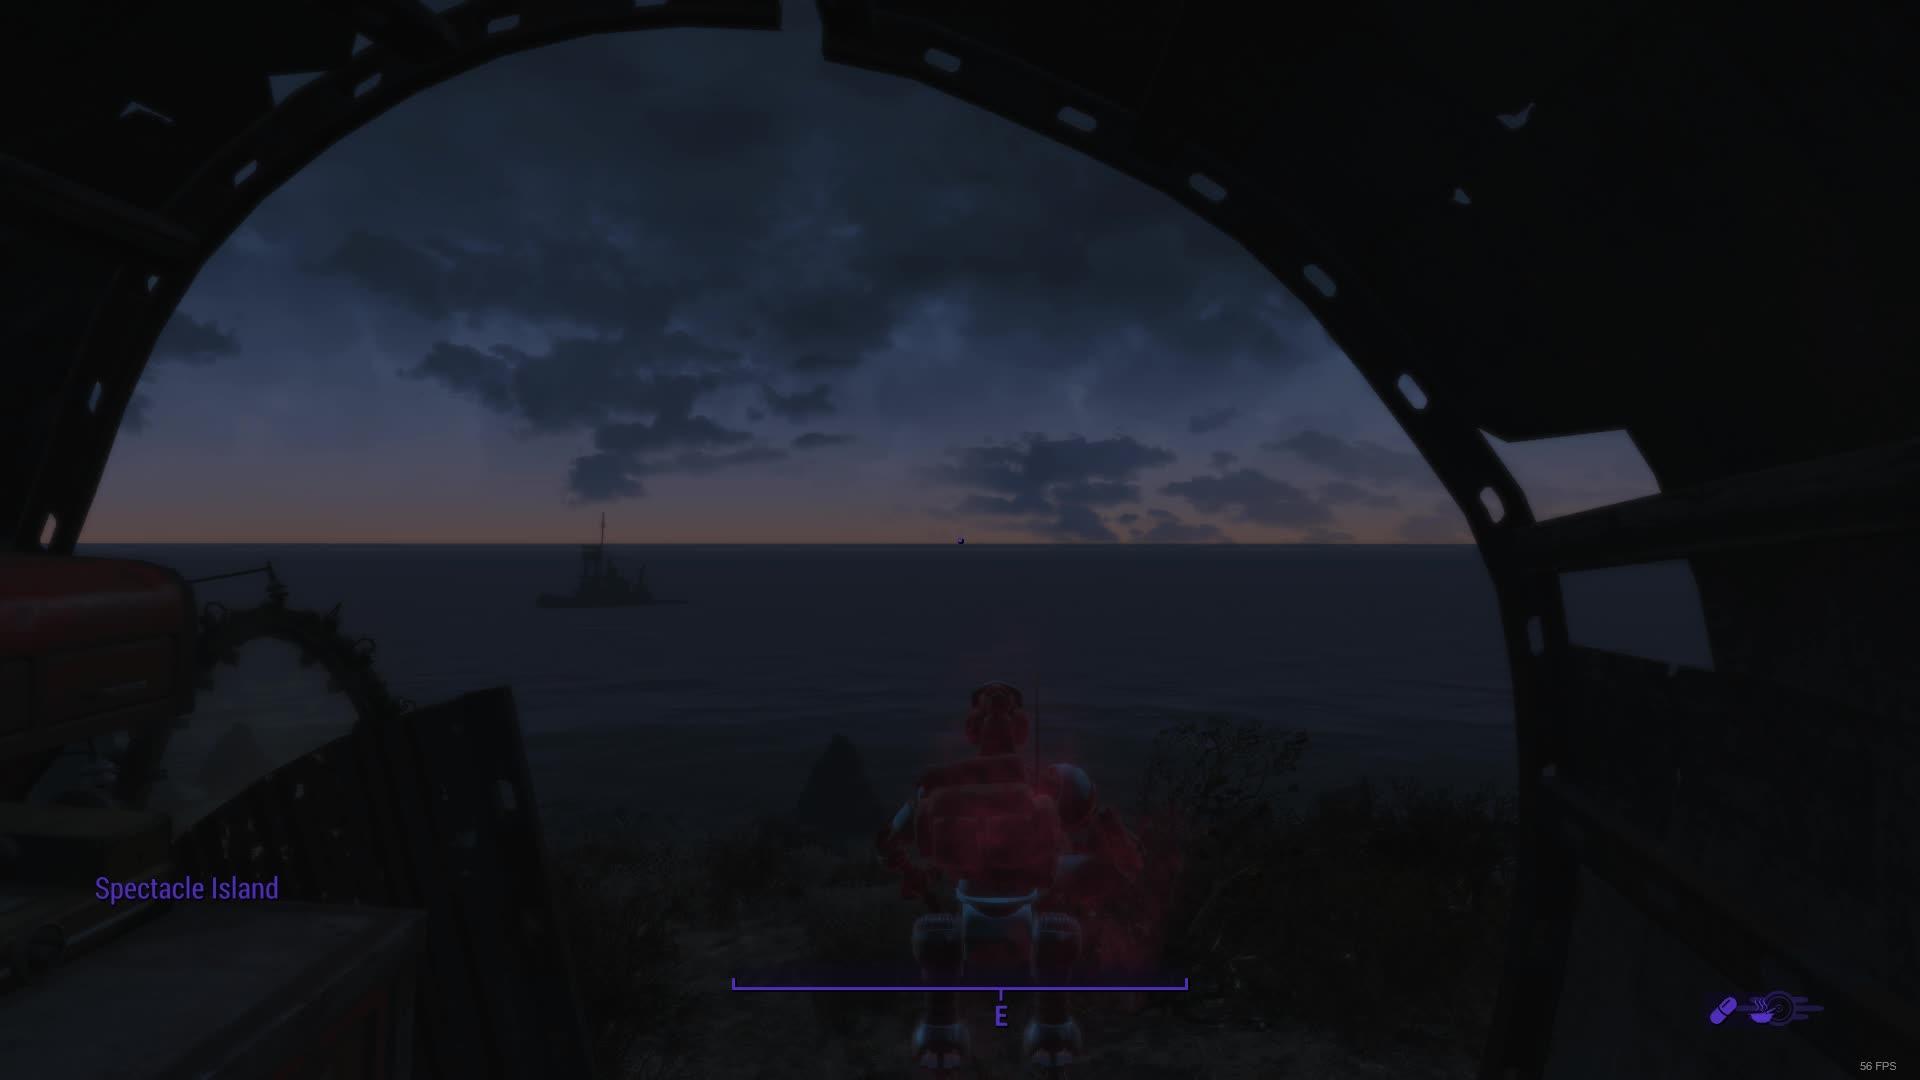 Fallout 4 04.13.2018 - 17.31.05.09 GIFs